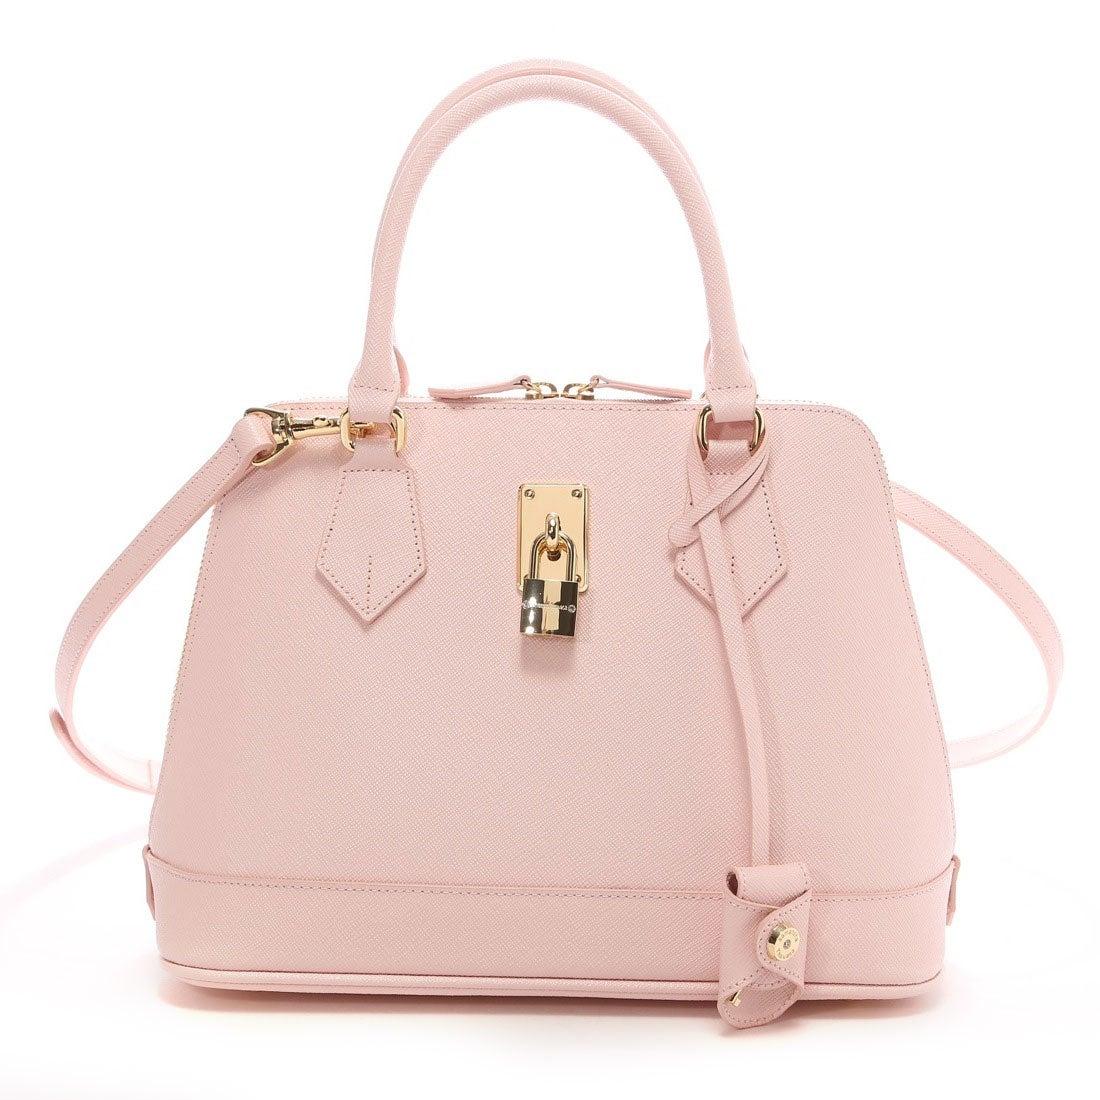 Handbag Design School